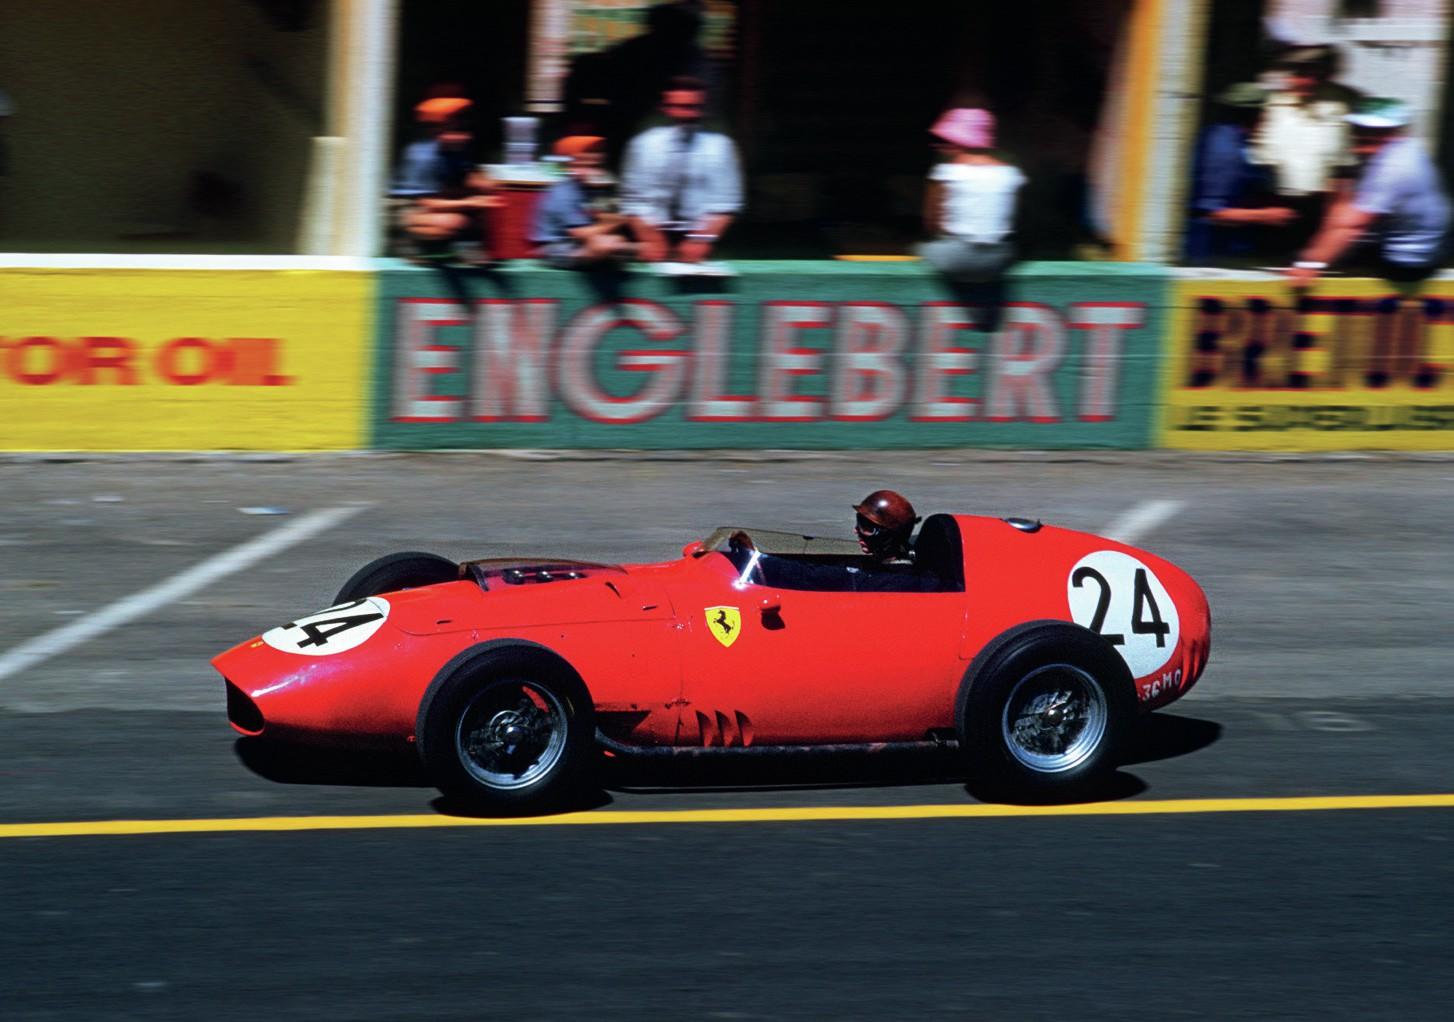 Tony Brooks in Ferrari Dino 246